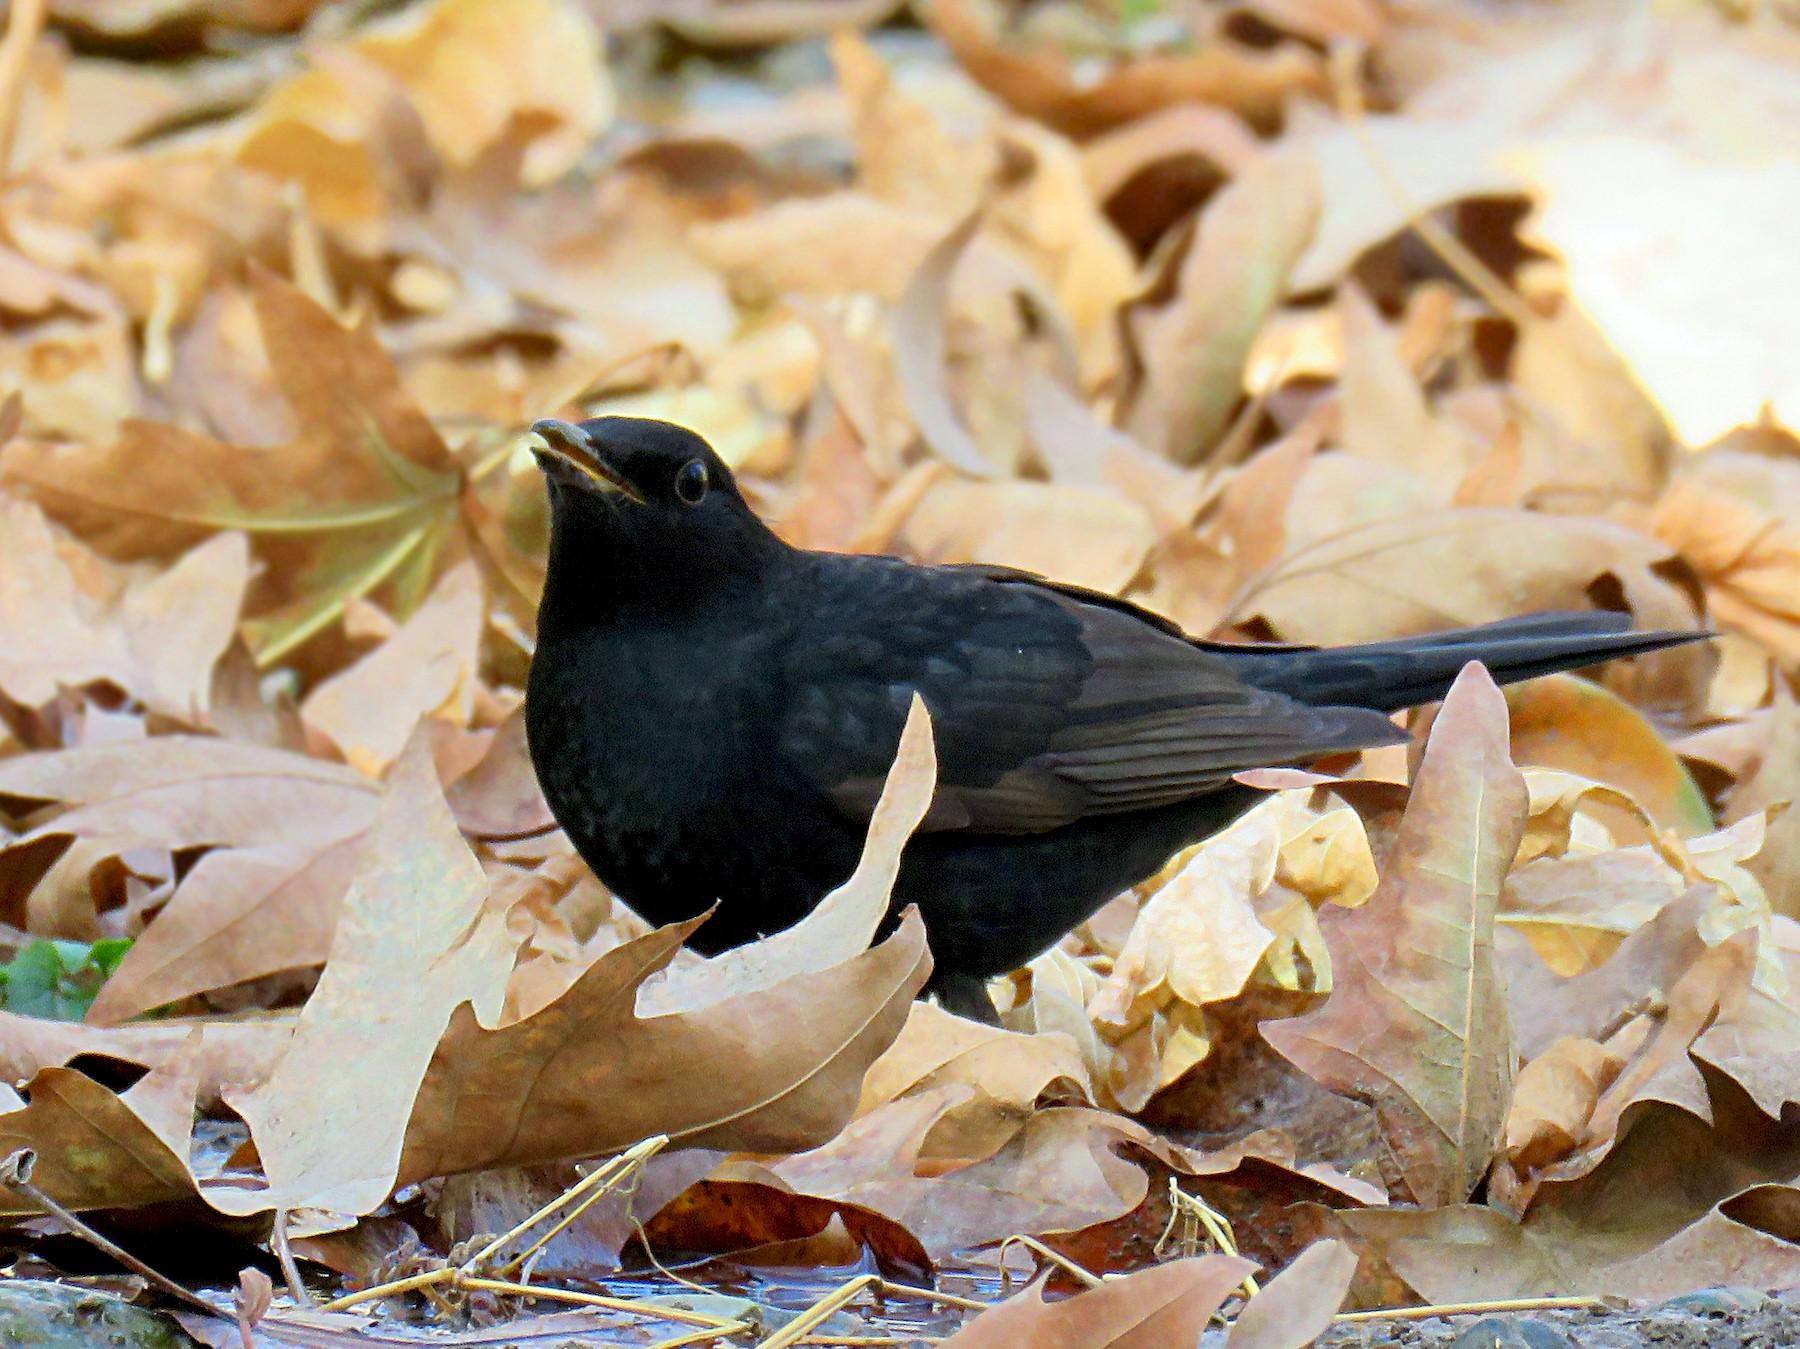 Eurasian Blackbird - Malihe Rajabi